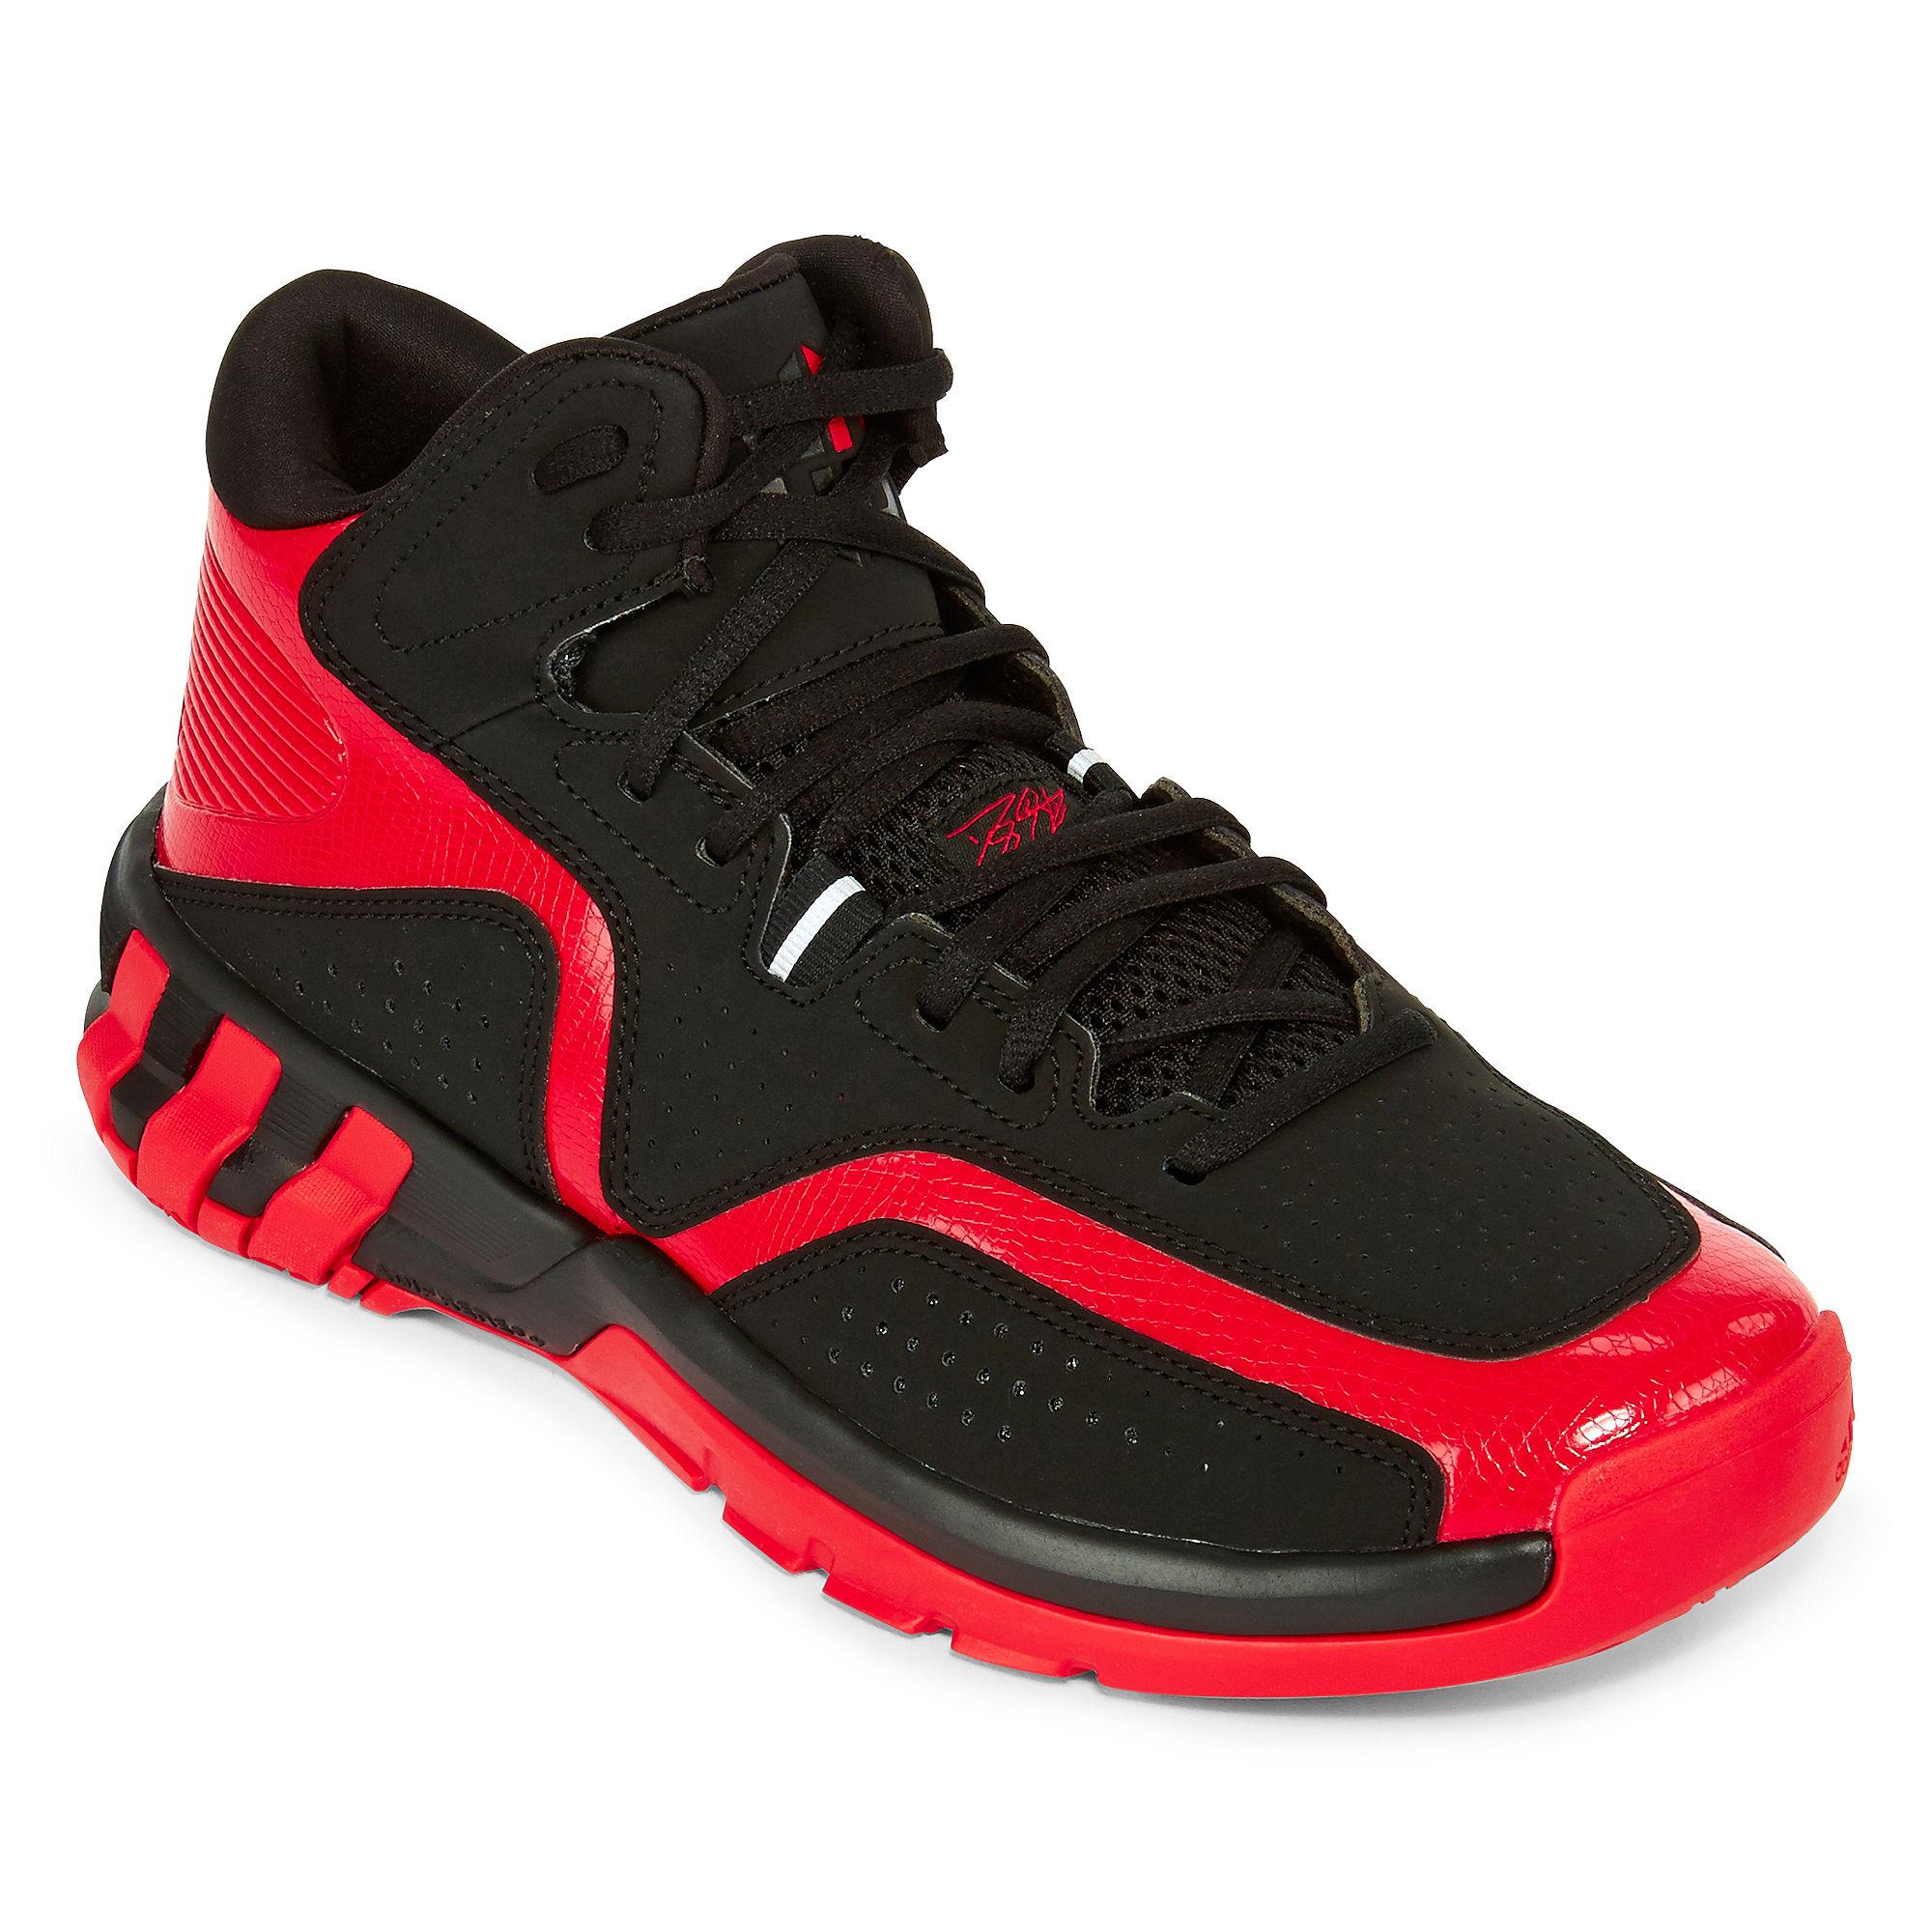 sneakers for cheap 84e31 ed695 UPC 888591920521. ZOOM. UPC 888591920521 has following Product Name  Variations adidas - D Howard 6 (BlackScarlet) Mens Basketball Shoes ...